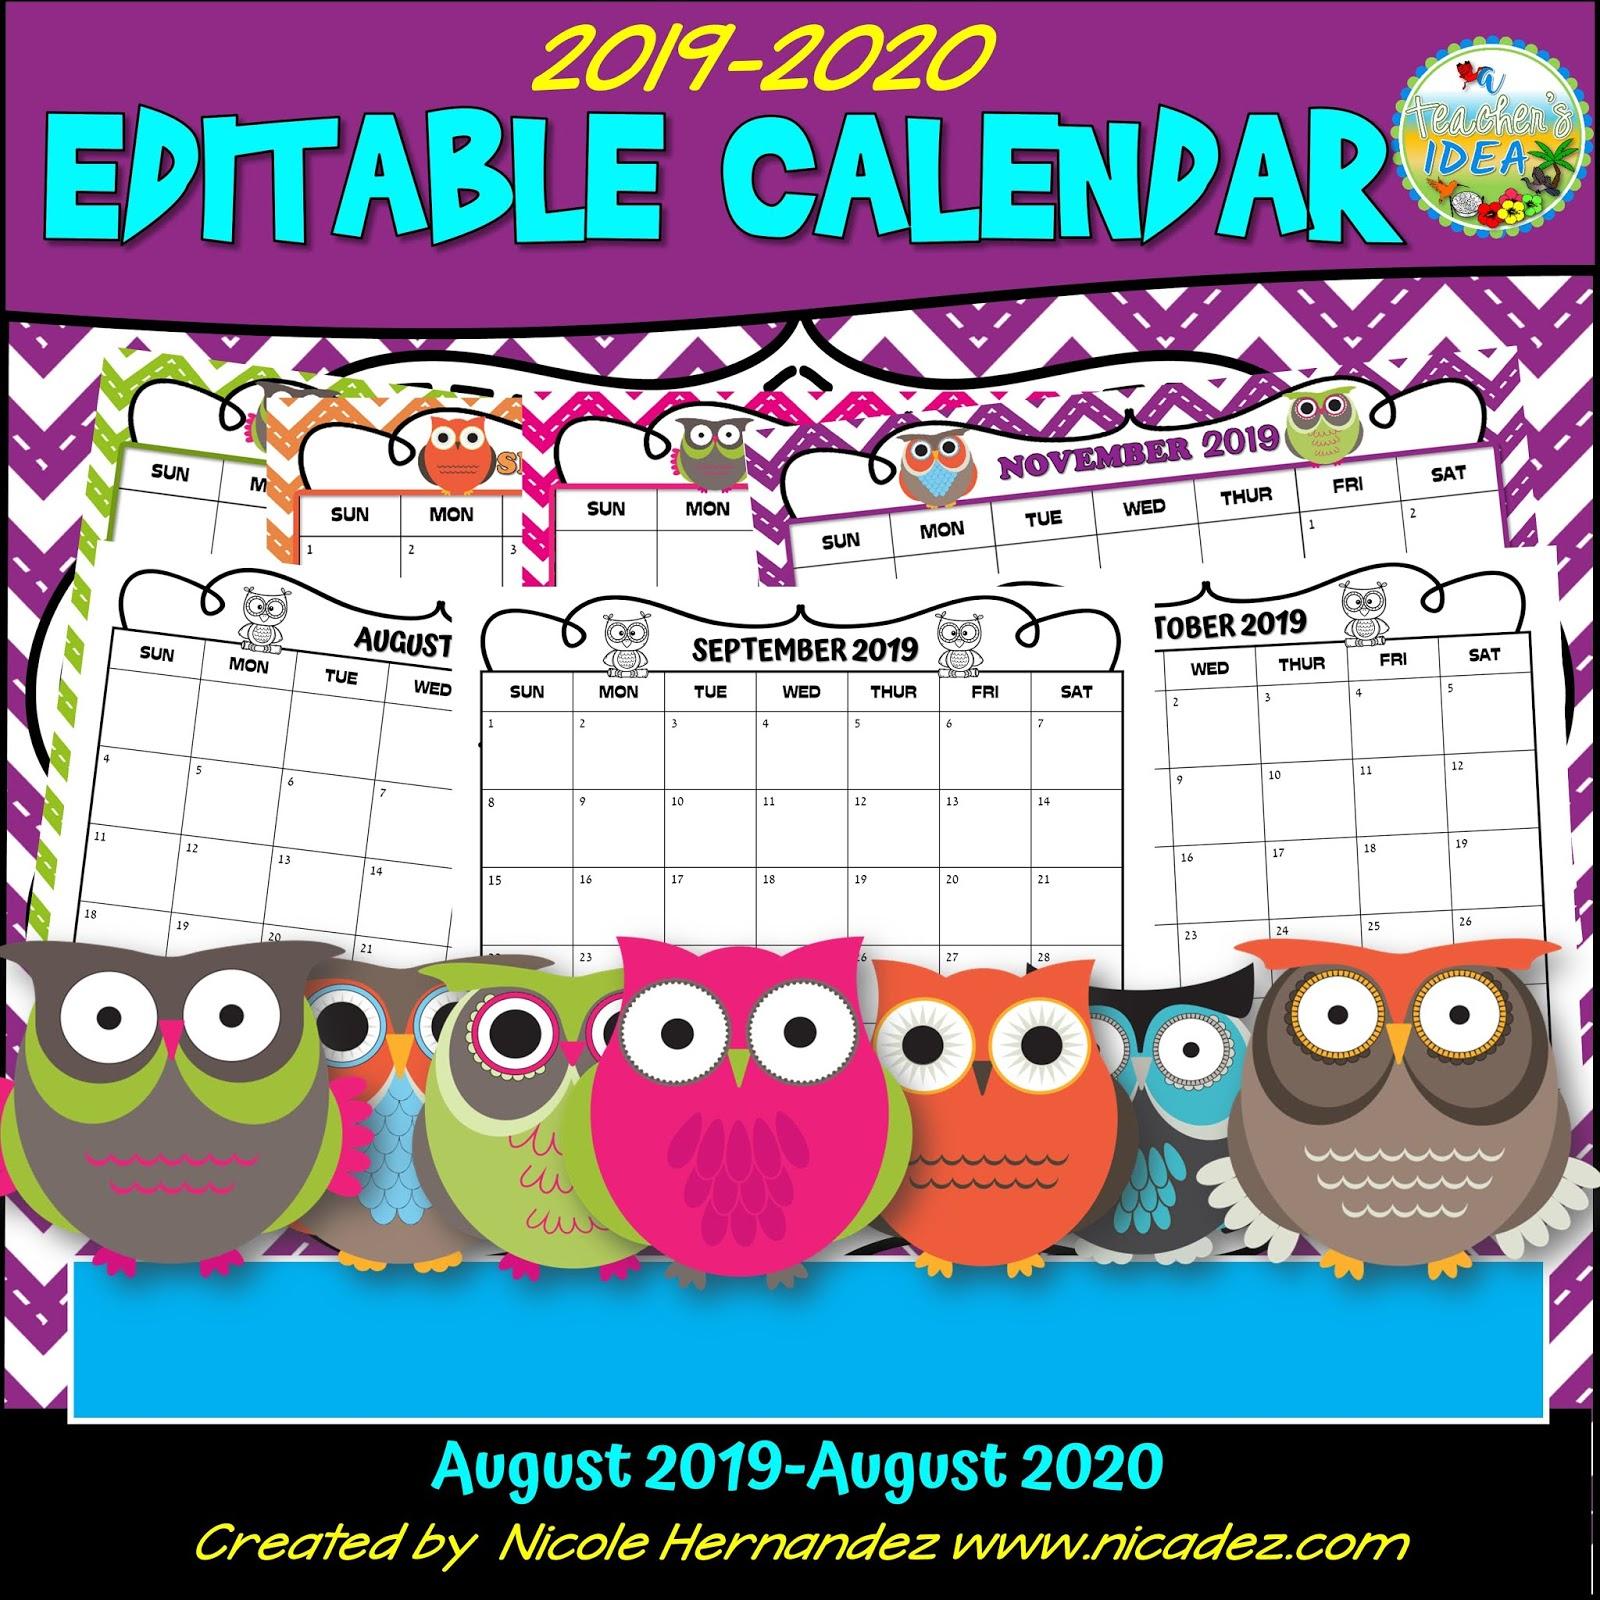 Quotes Teacher Calendar 2019 2020: A Teacher's Idea